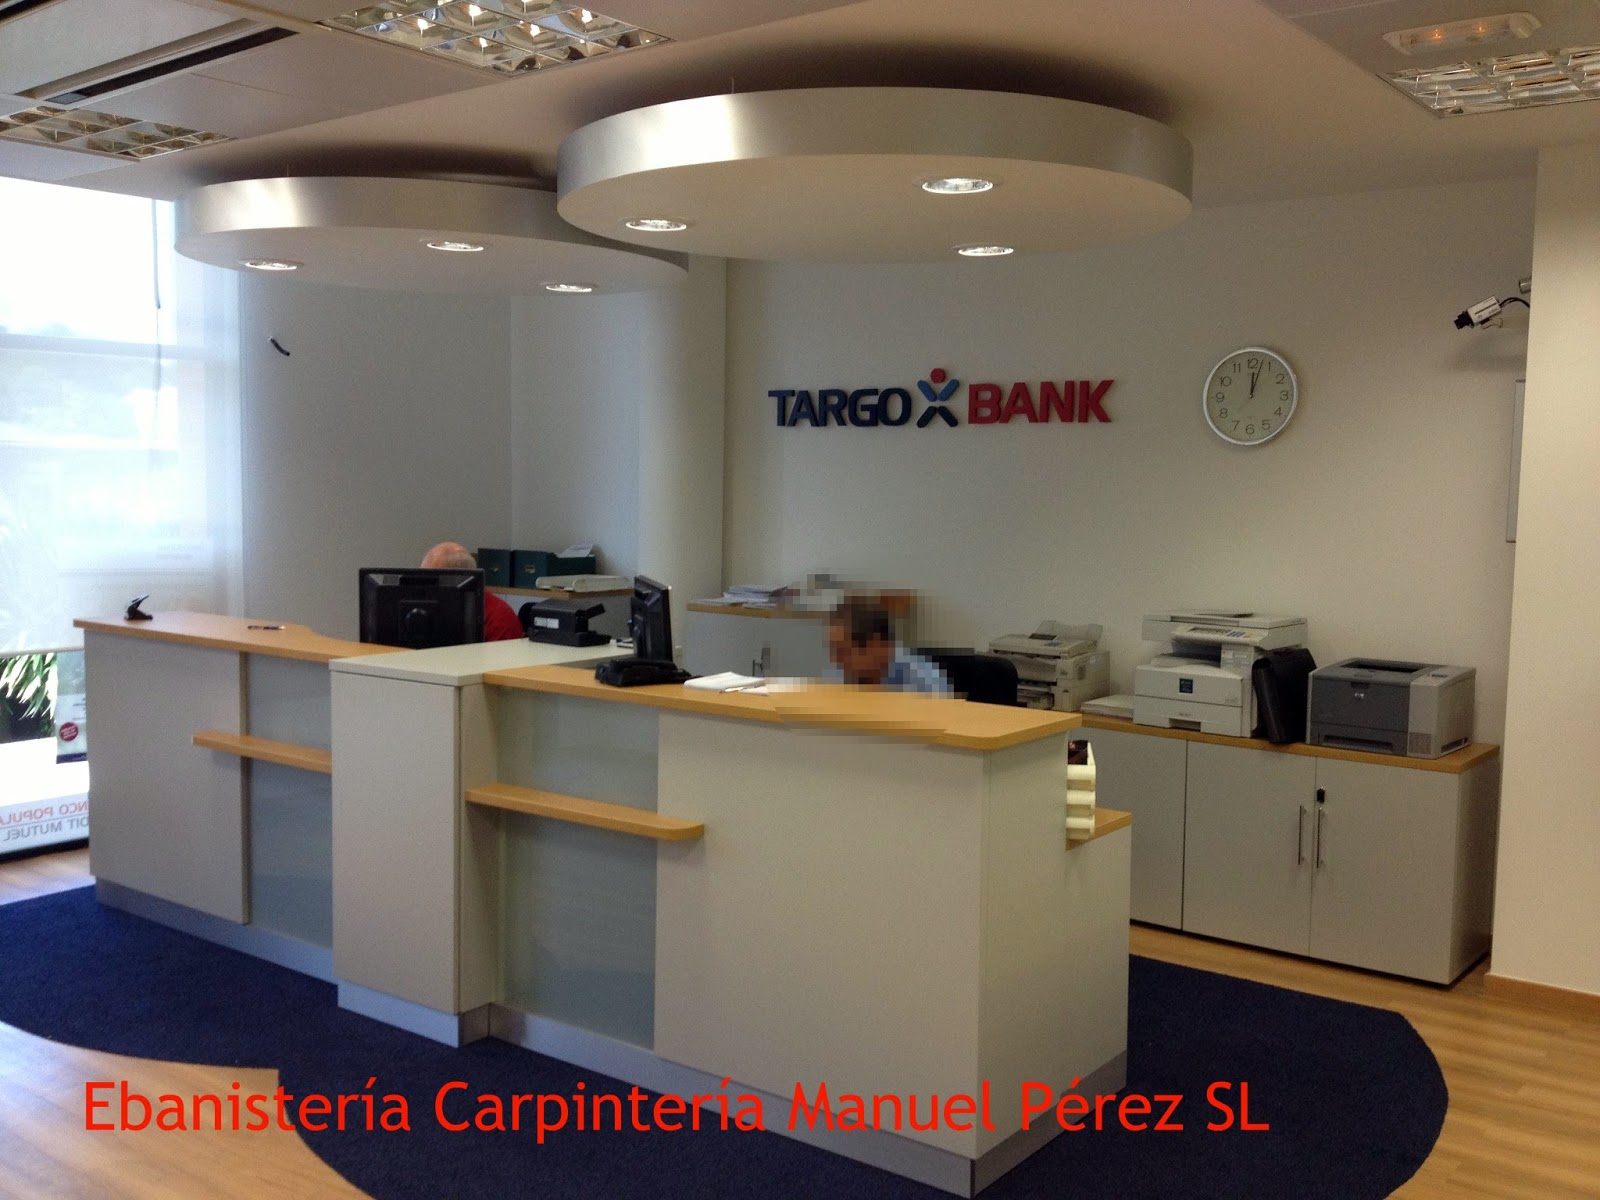 Ebanisteria carpinteria manuel perez zaragoza for Oficinas targobank